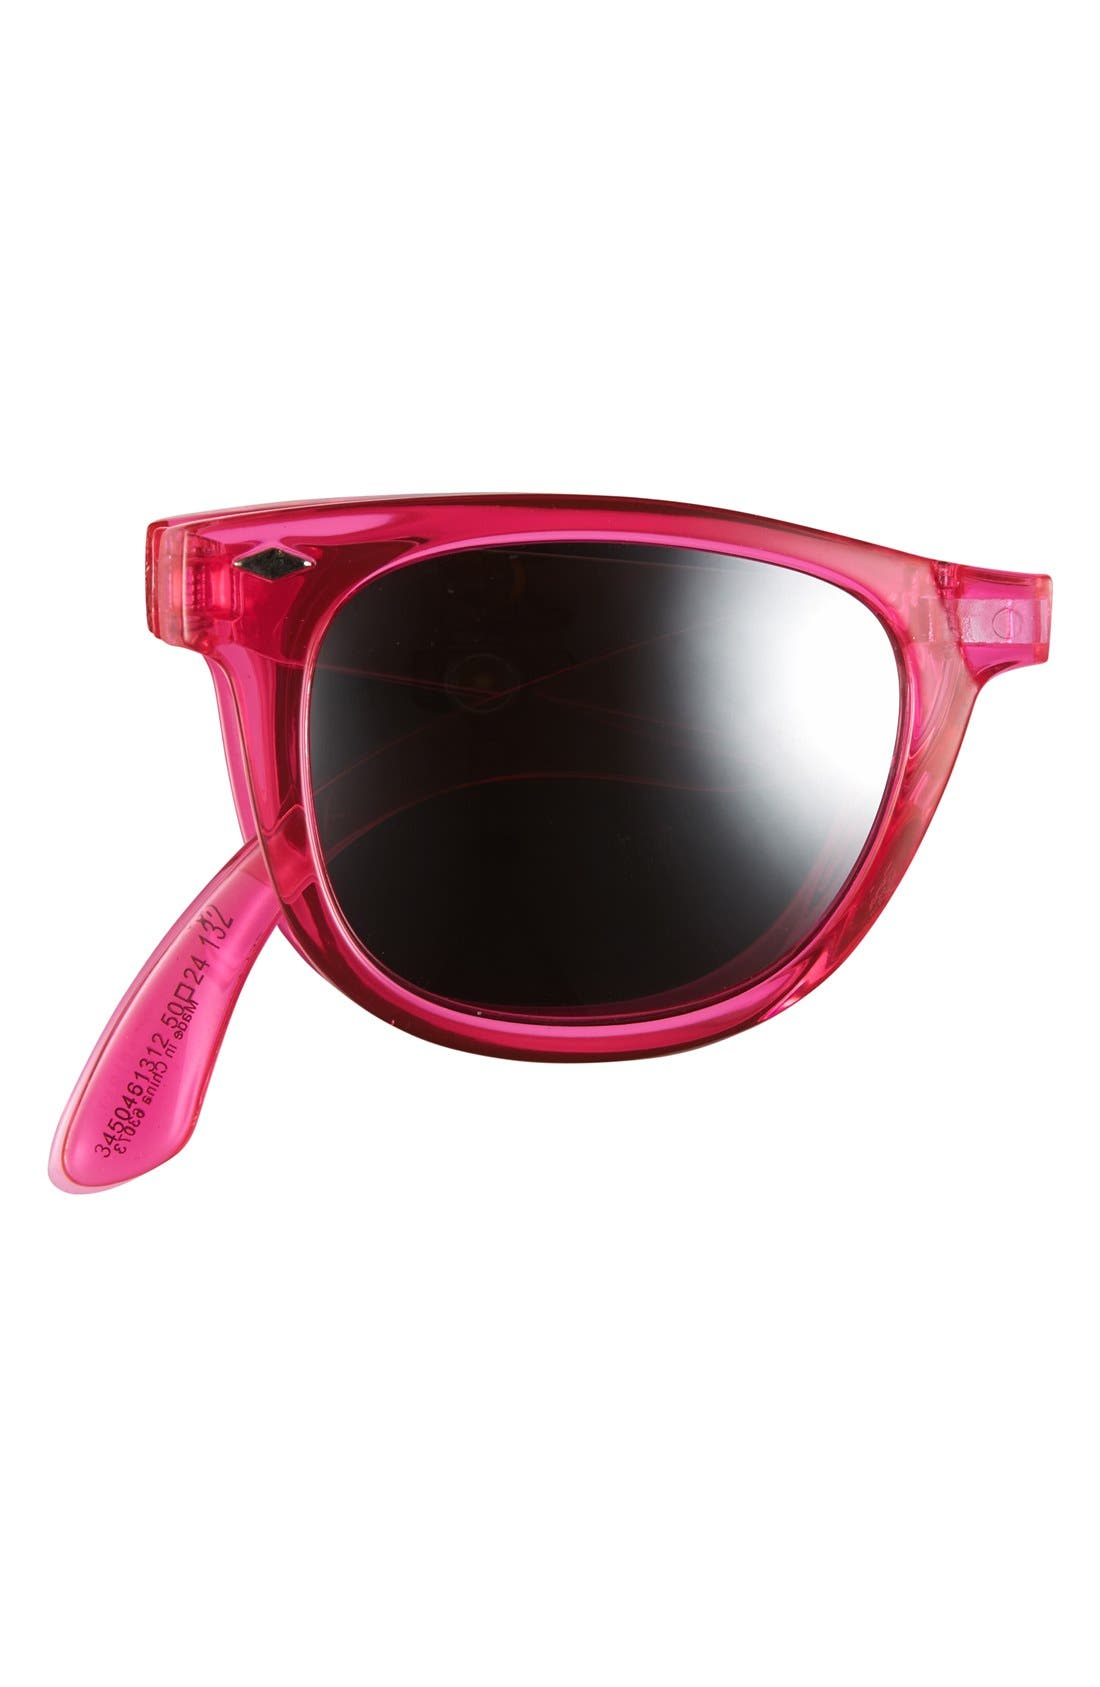 Alternate Image 2  - Outlook Eyewear 'Caliente' 50mm Foldable Sunglasses